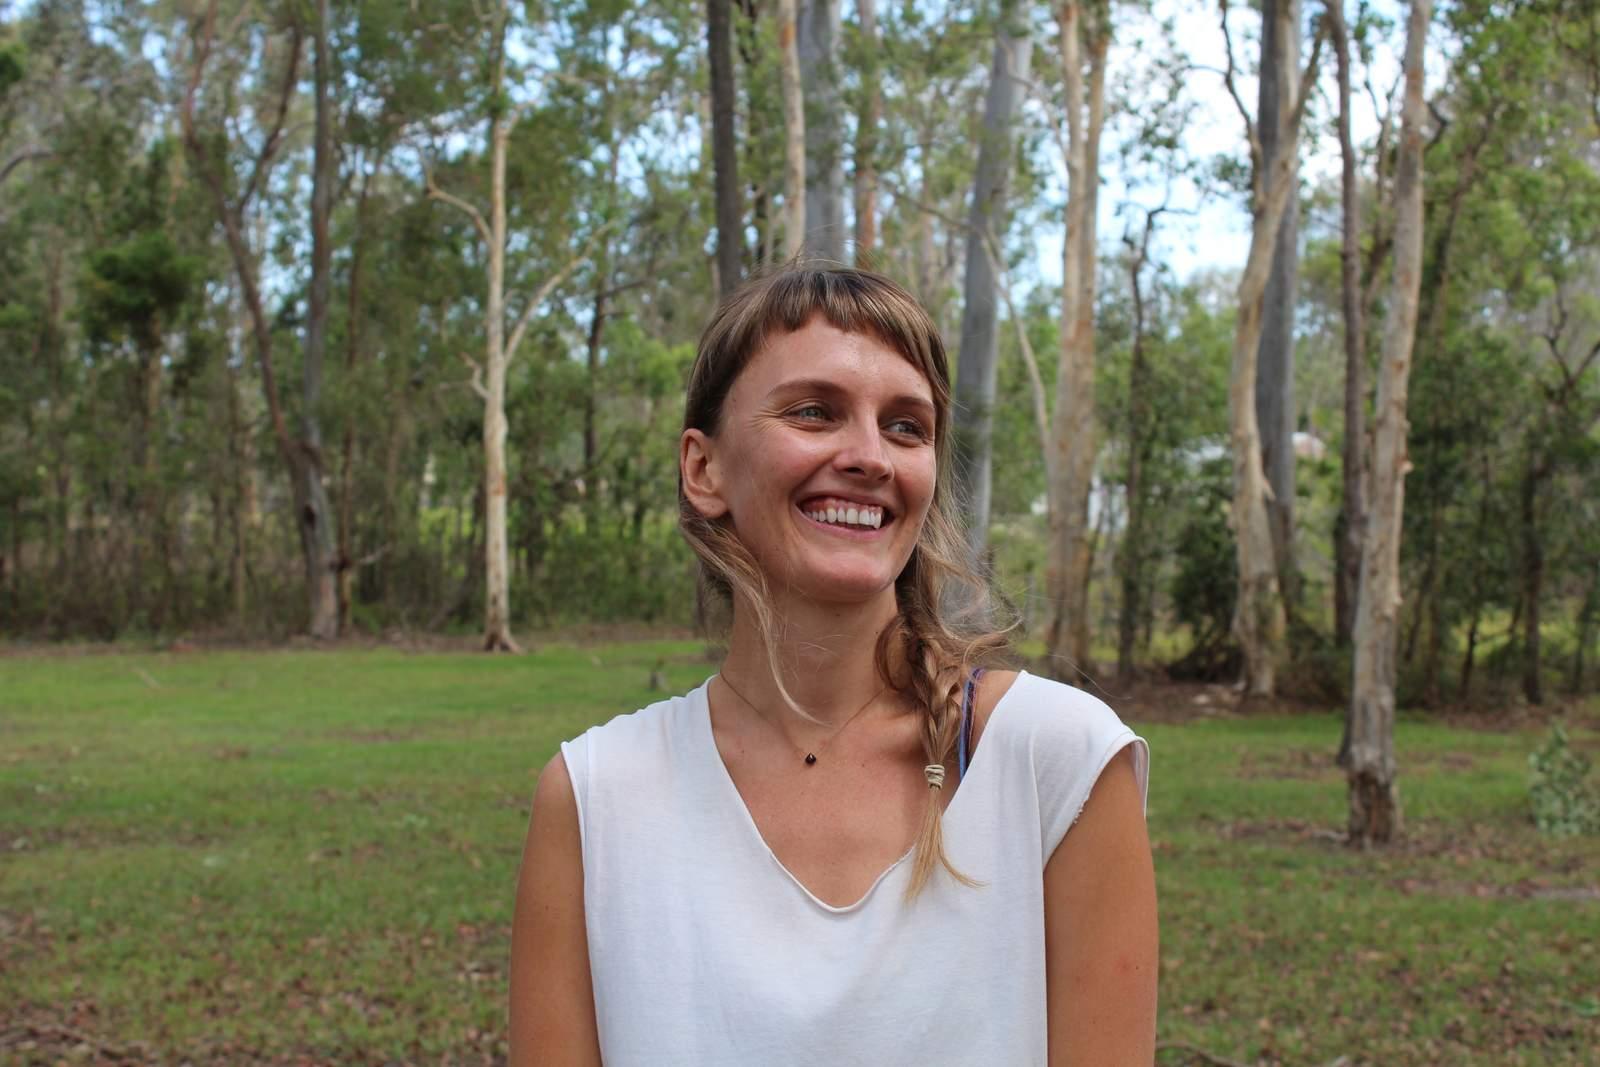 Laura Phipps